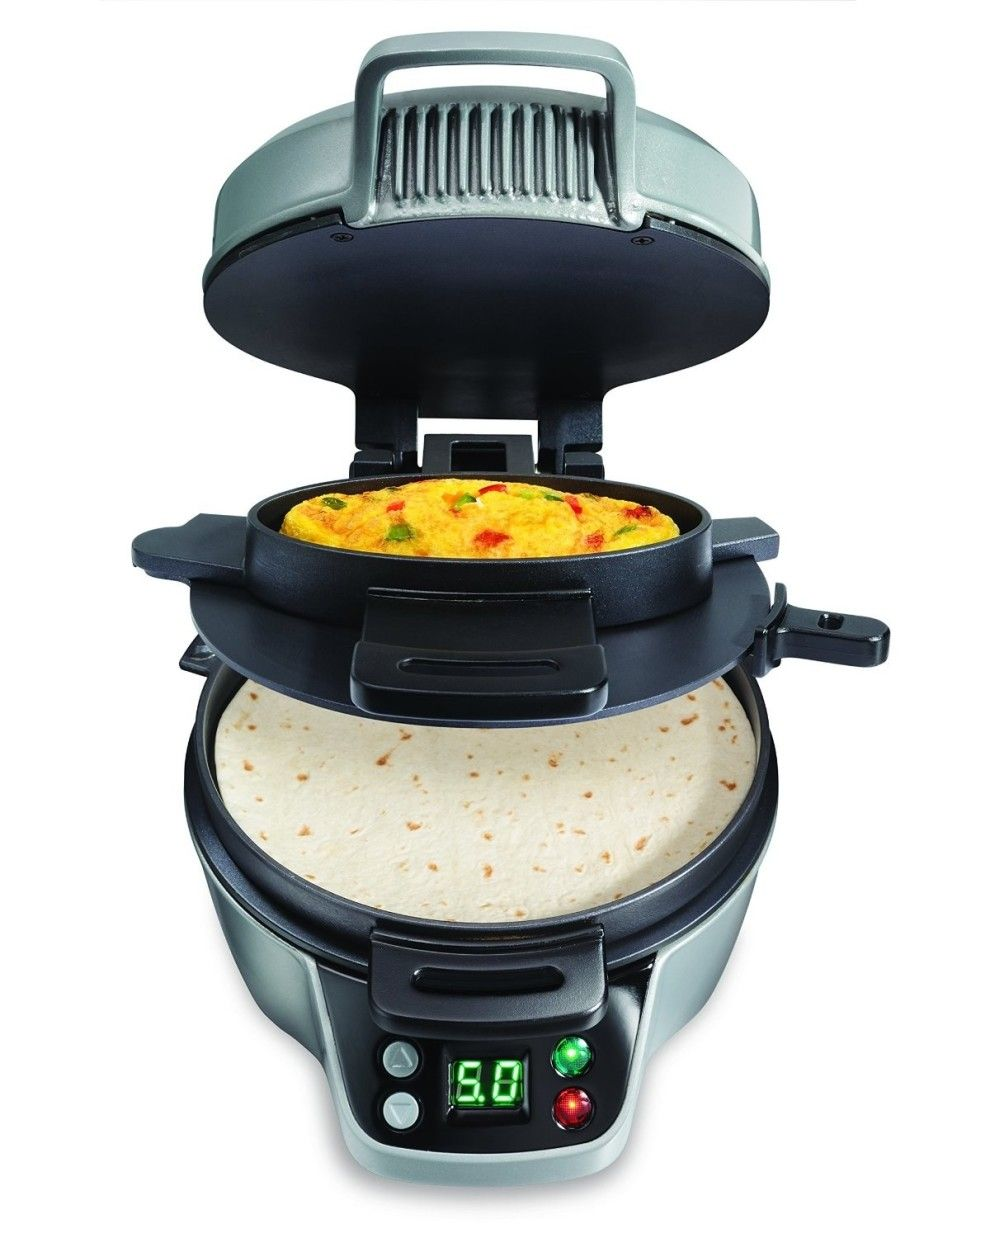 kitchenaid waffle maker instructions